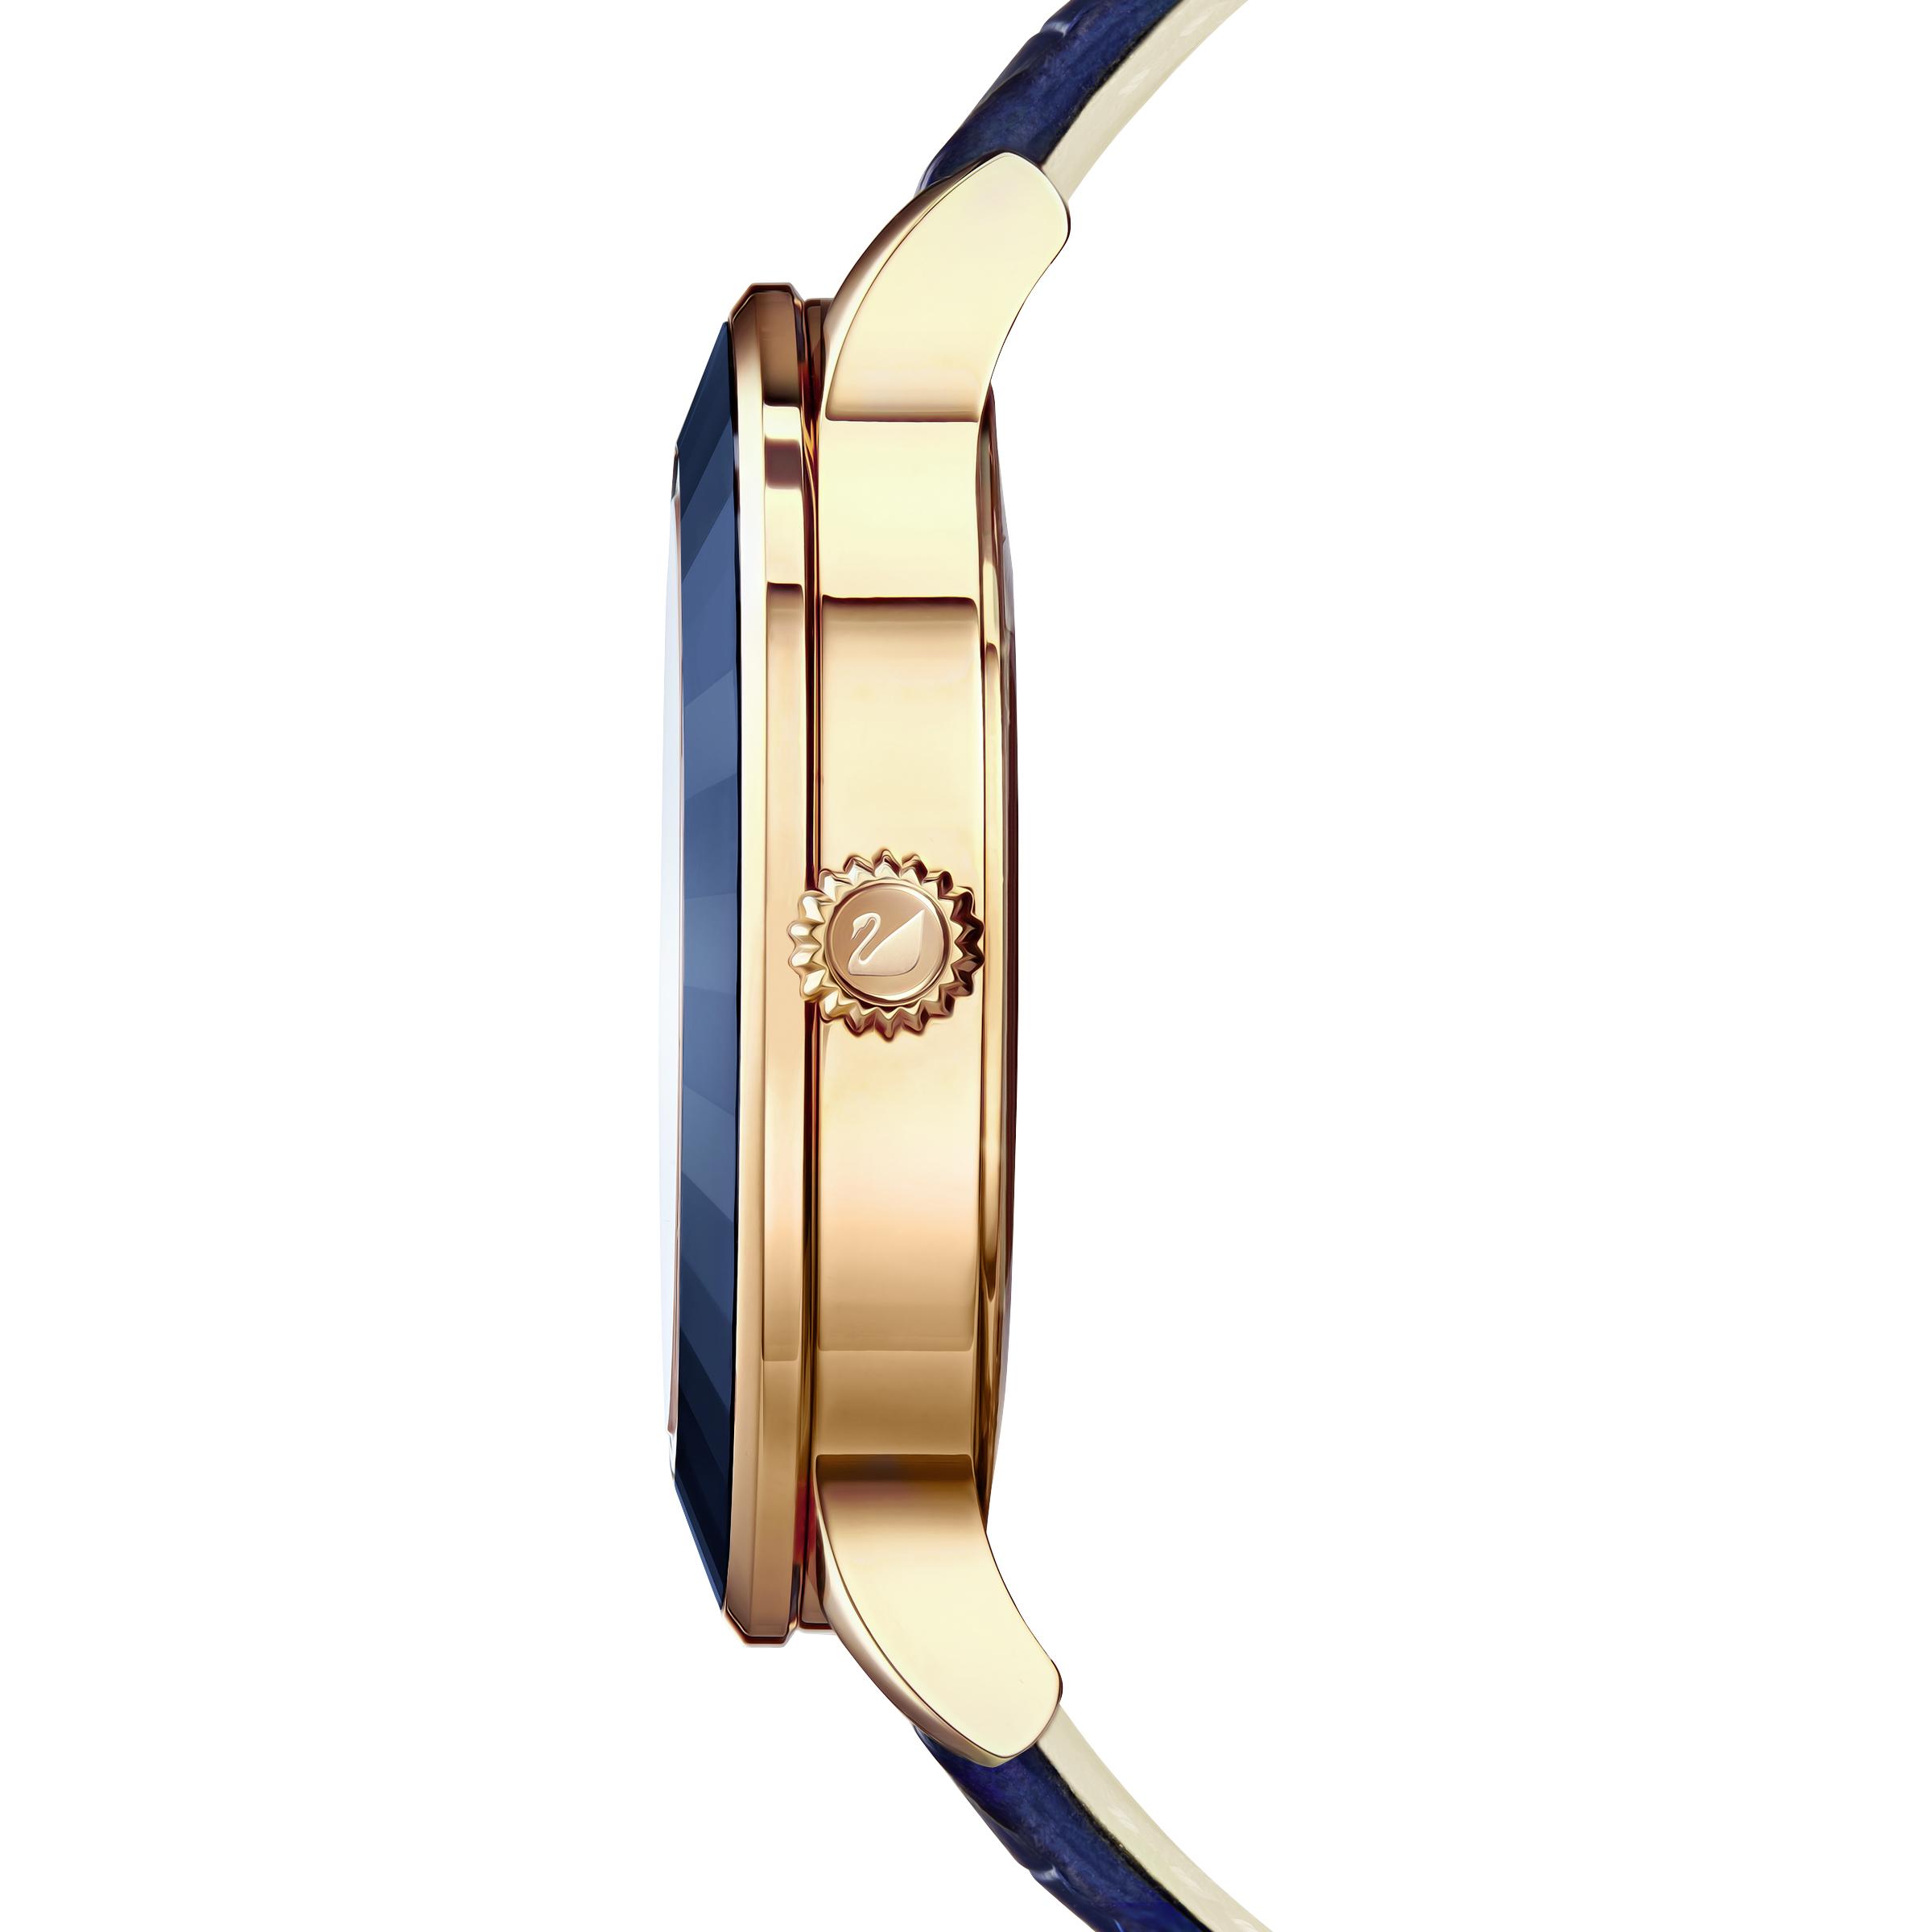 Montre Octea Lux, Bracelet en cuir, bleu, PVD doré rose Swarovski